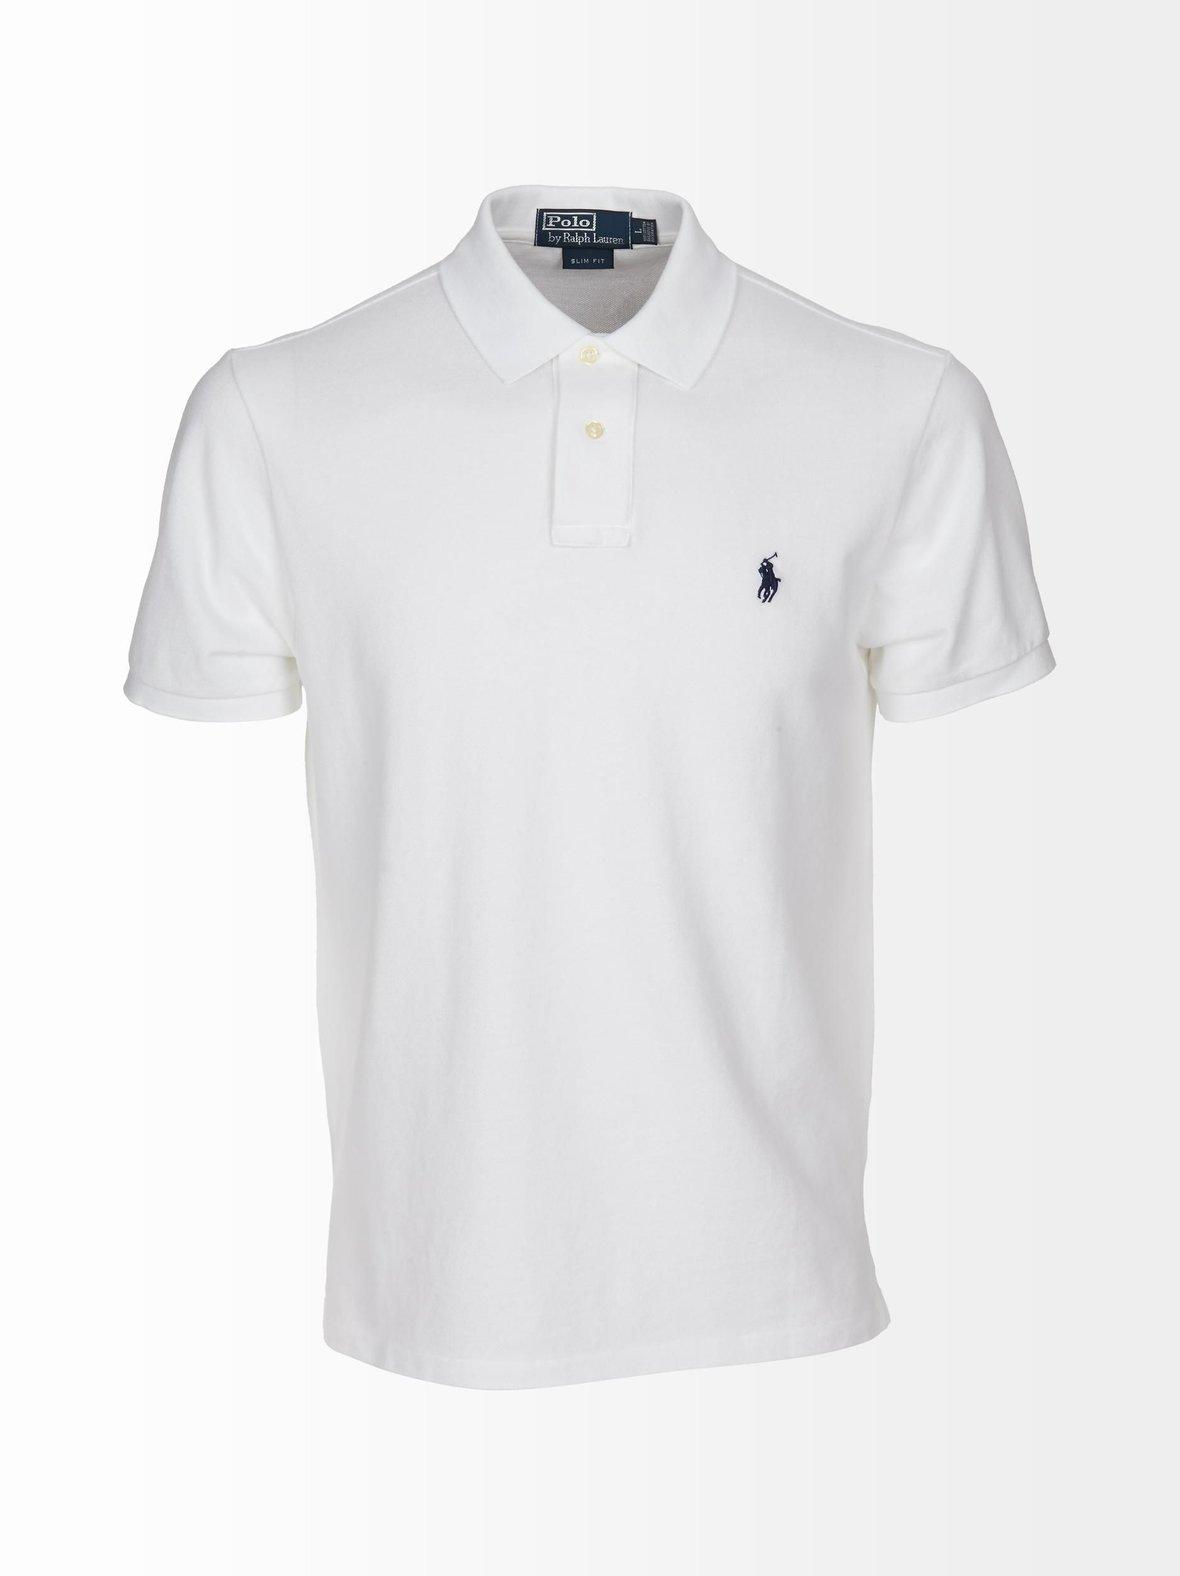 Valkoinen Polo Ralph Lauren miesten pikeepaita logolla  38b27366c7